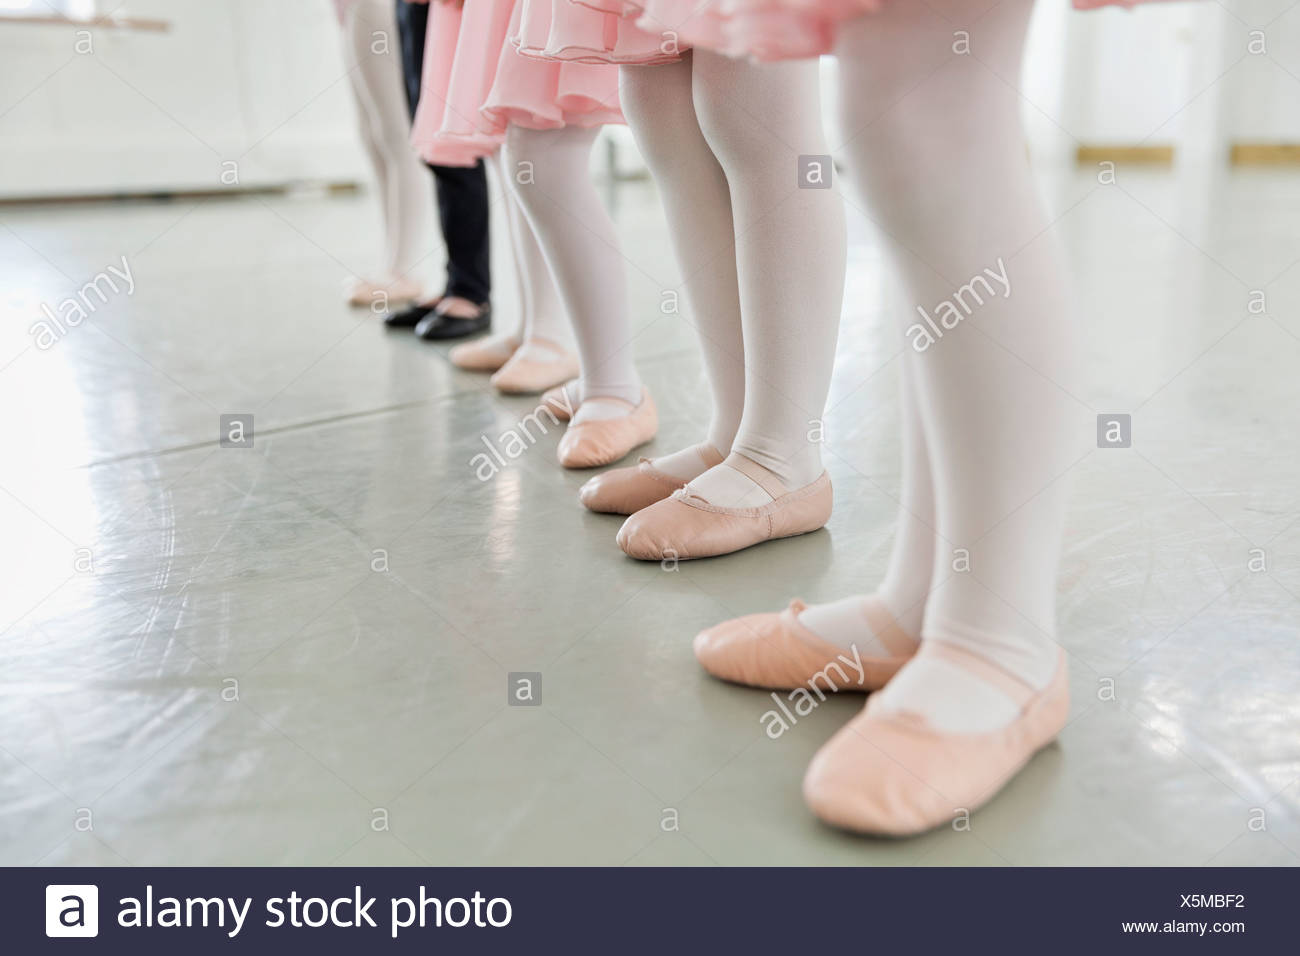 Line of children's feet in ballet slippers in ballet studio Stock Photo